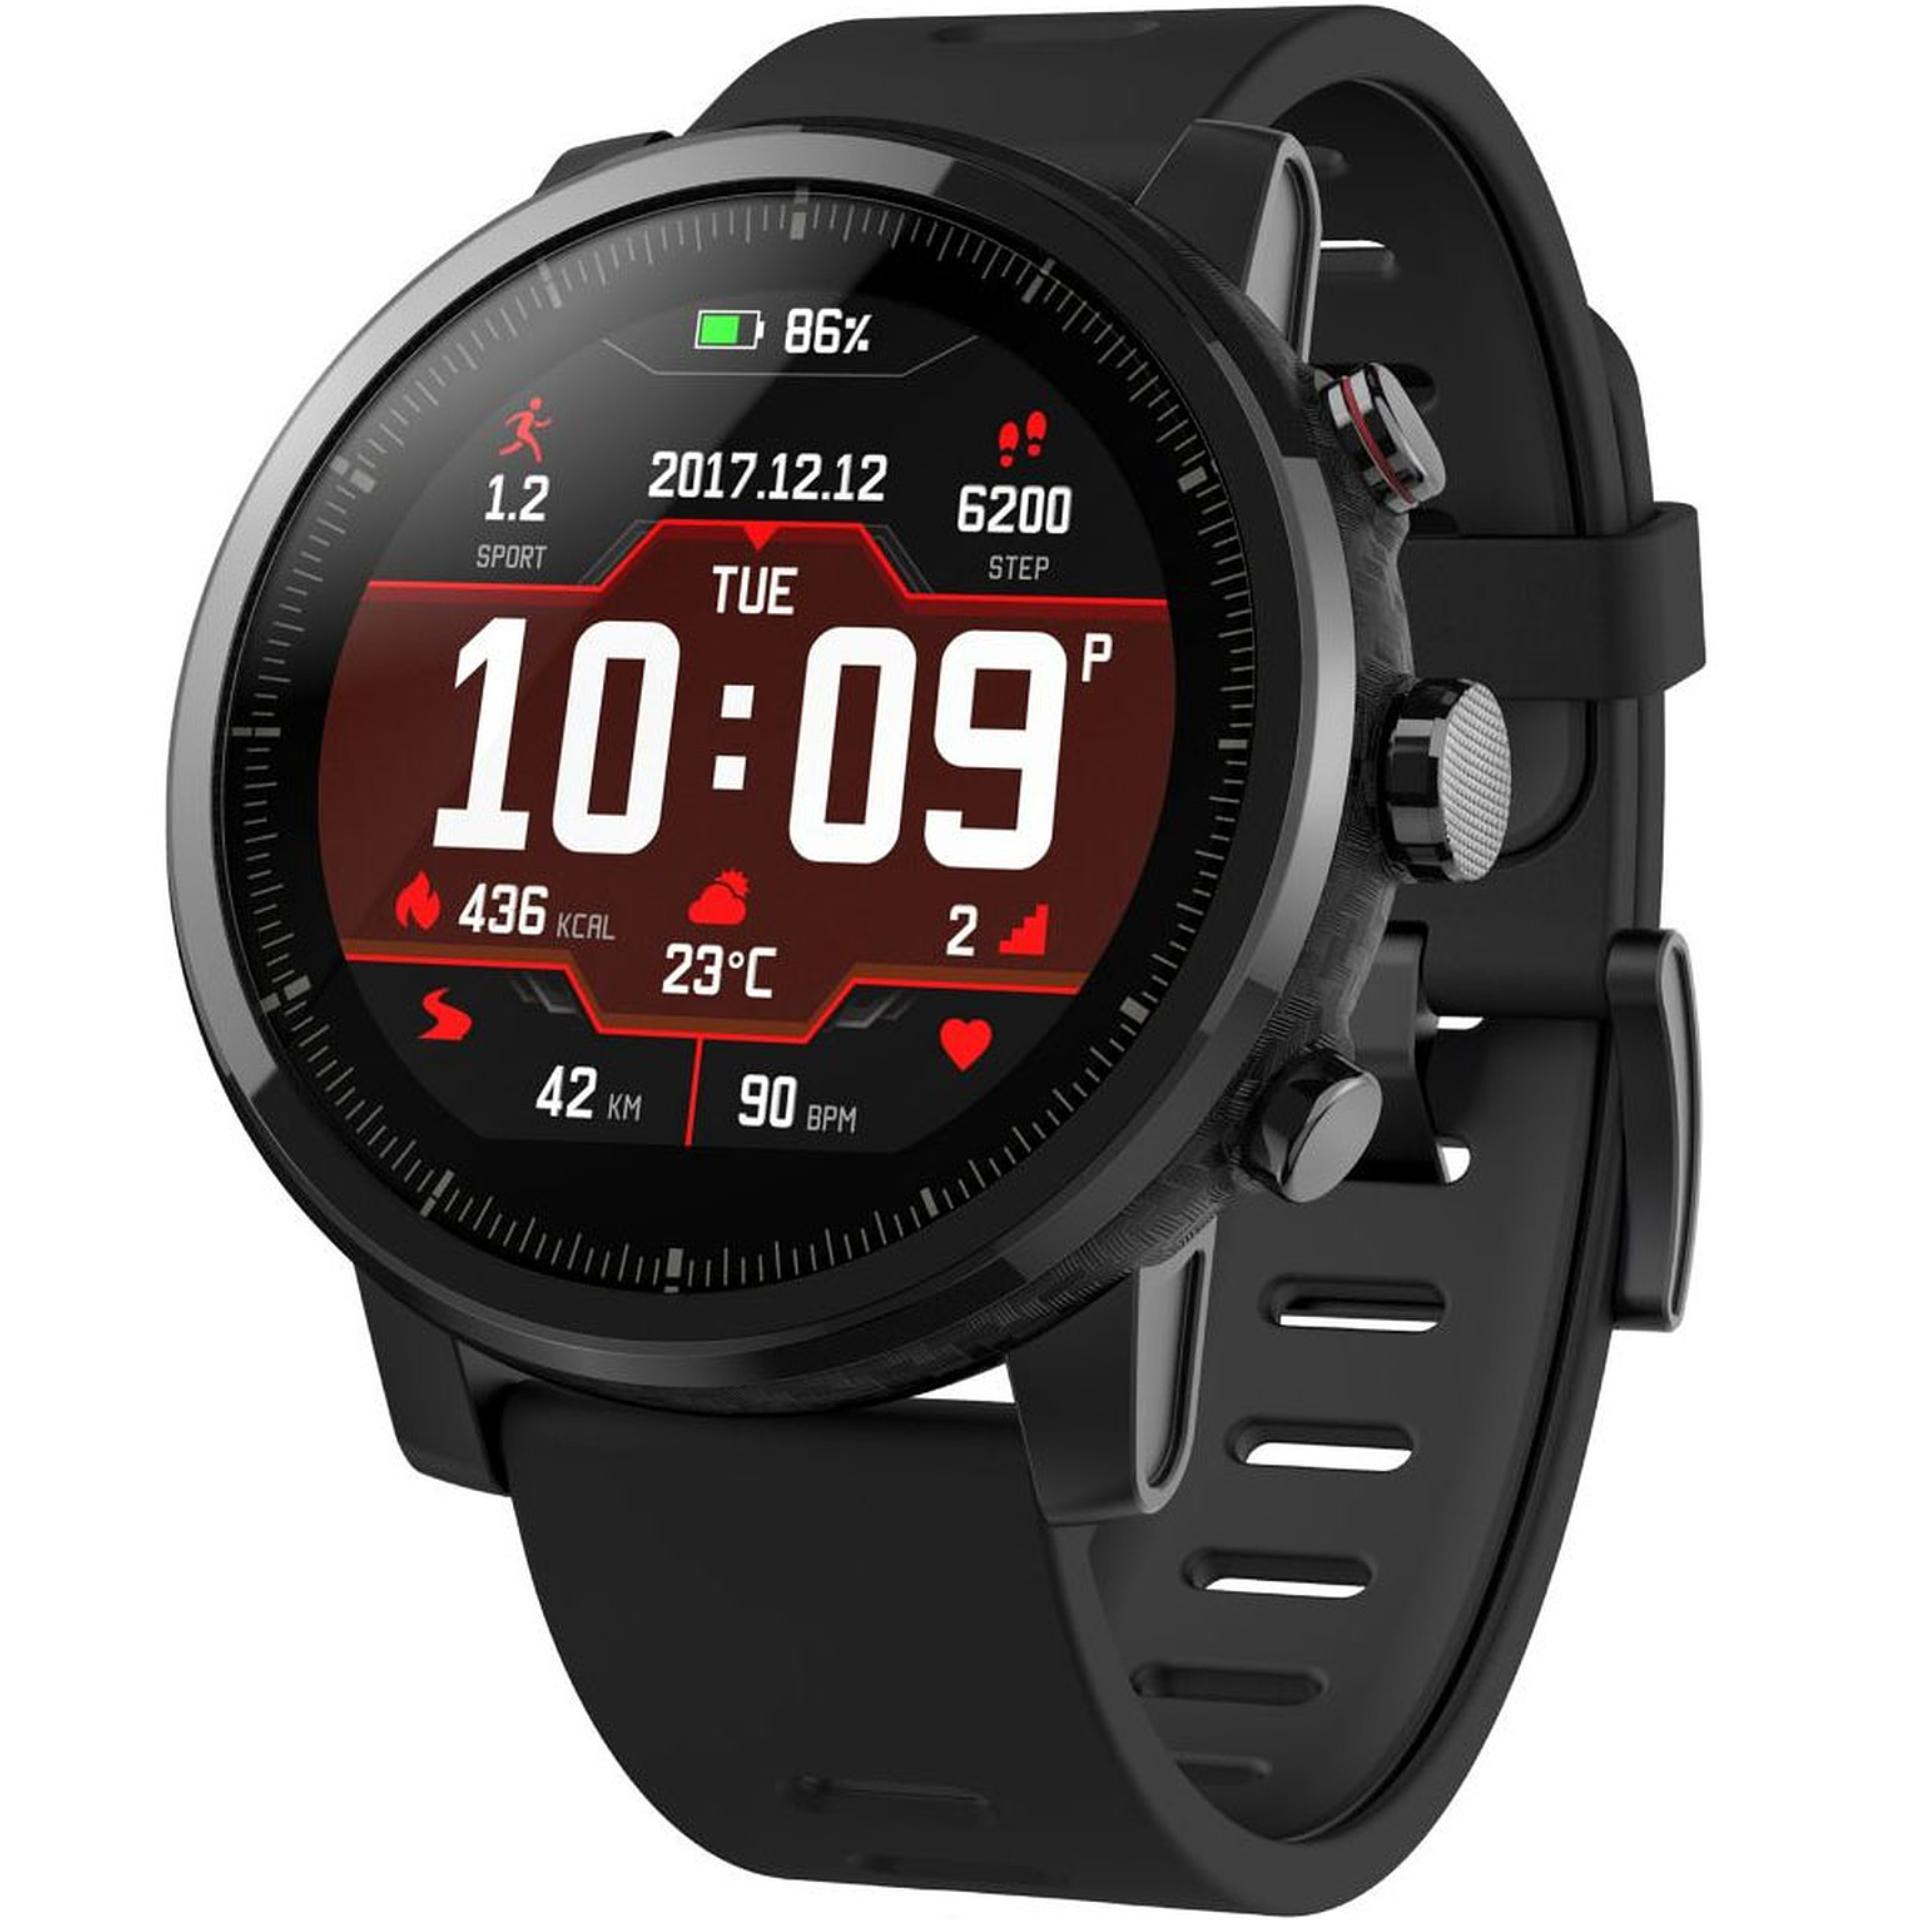 "Amazfit Stratos: Smartwatch (1.34"" Display, 512MB RAM, 4GB Speicher, Pulsmesser, Barometer, GPS, WLAN, Bluetooth, GPX Import, 3 Tage Akku)"